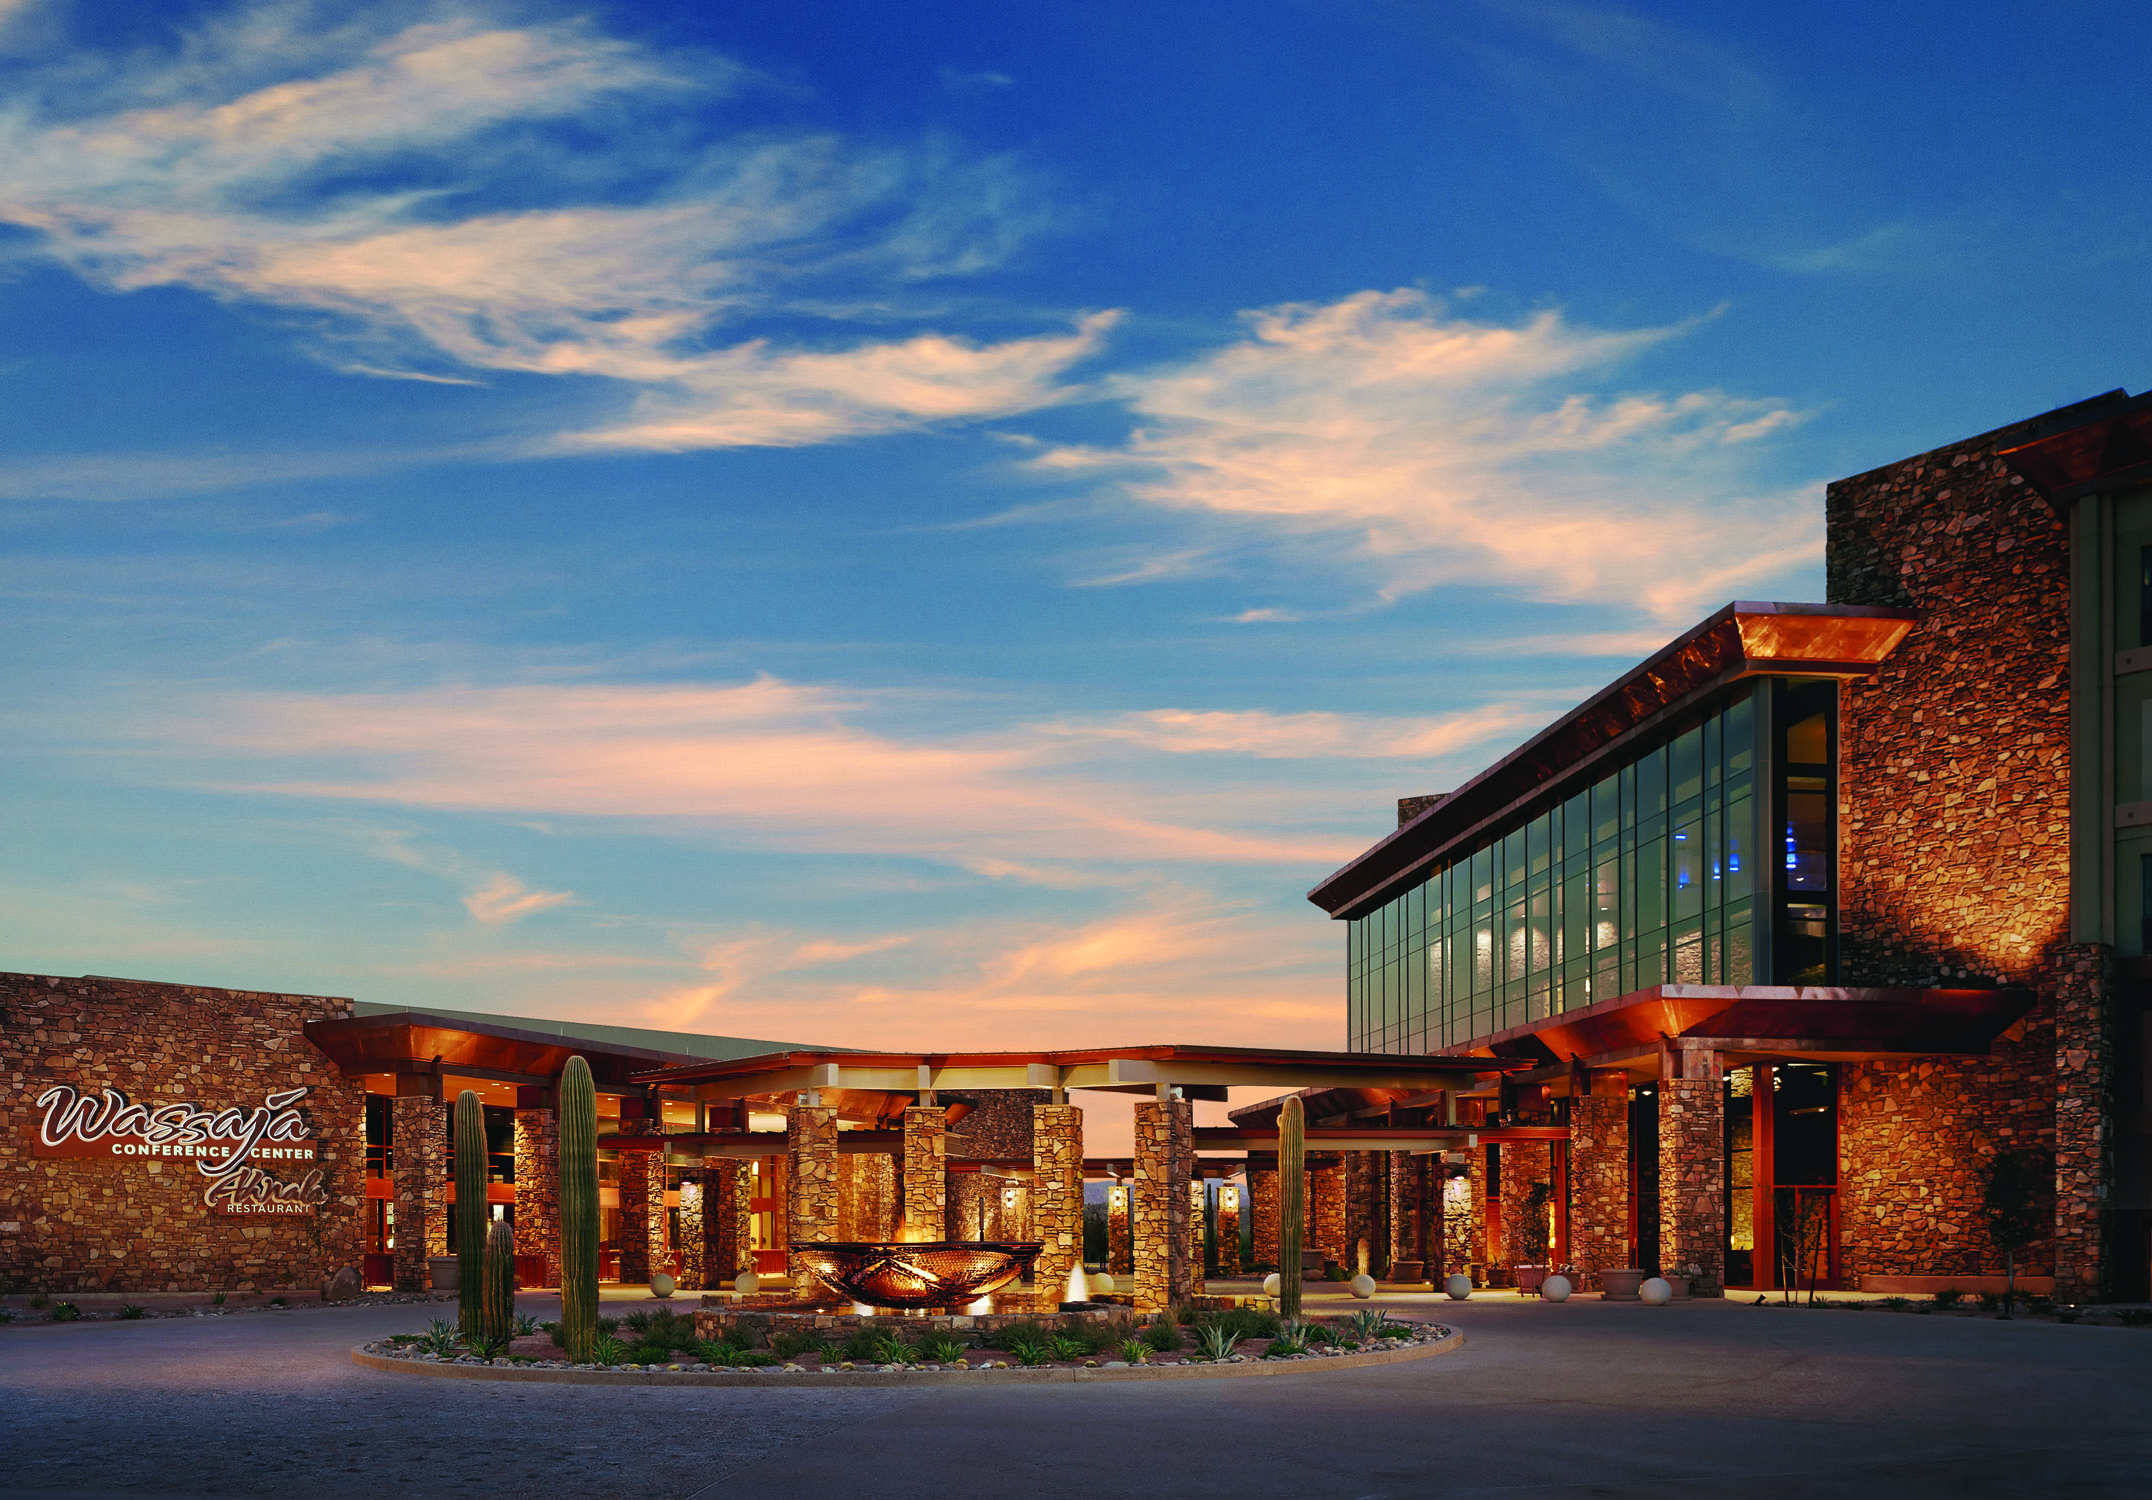 Employment at ft mcdowell casino isle casino biloxi ms reviews